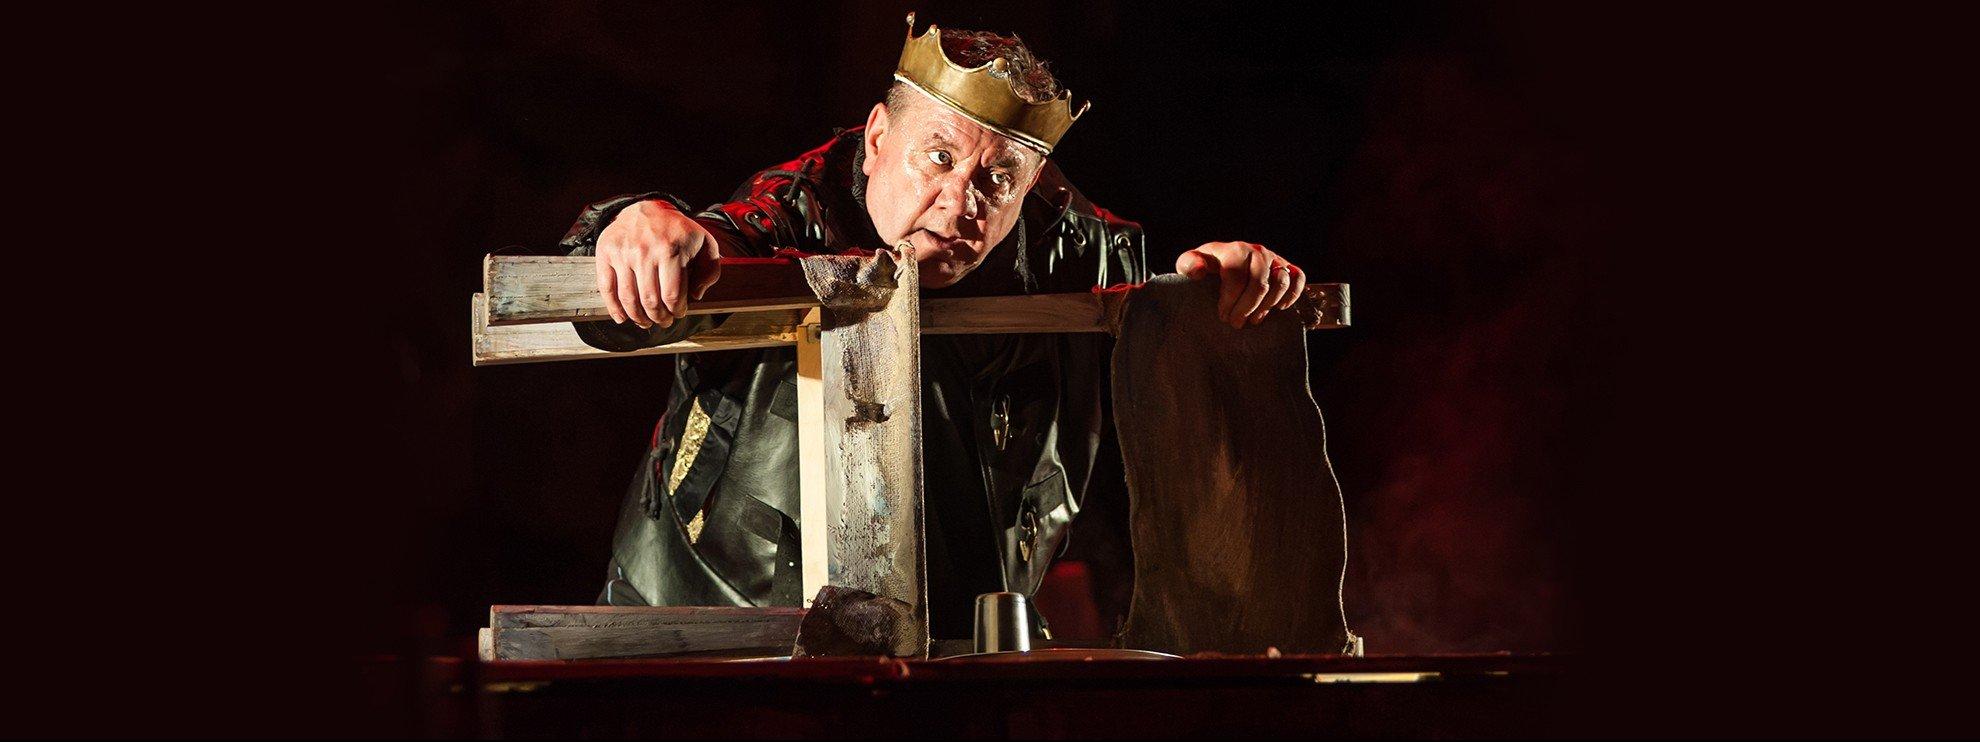 performer Bogdan Benyuk